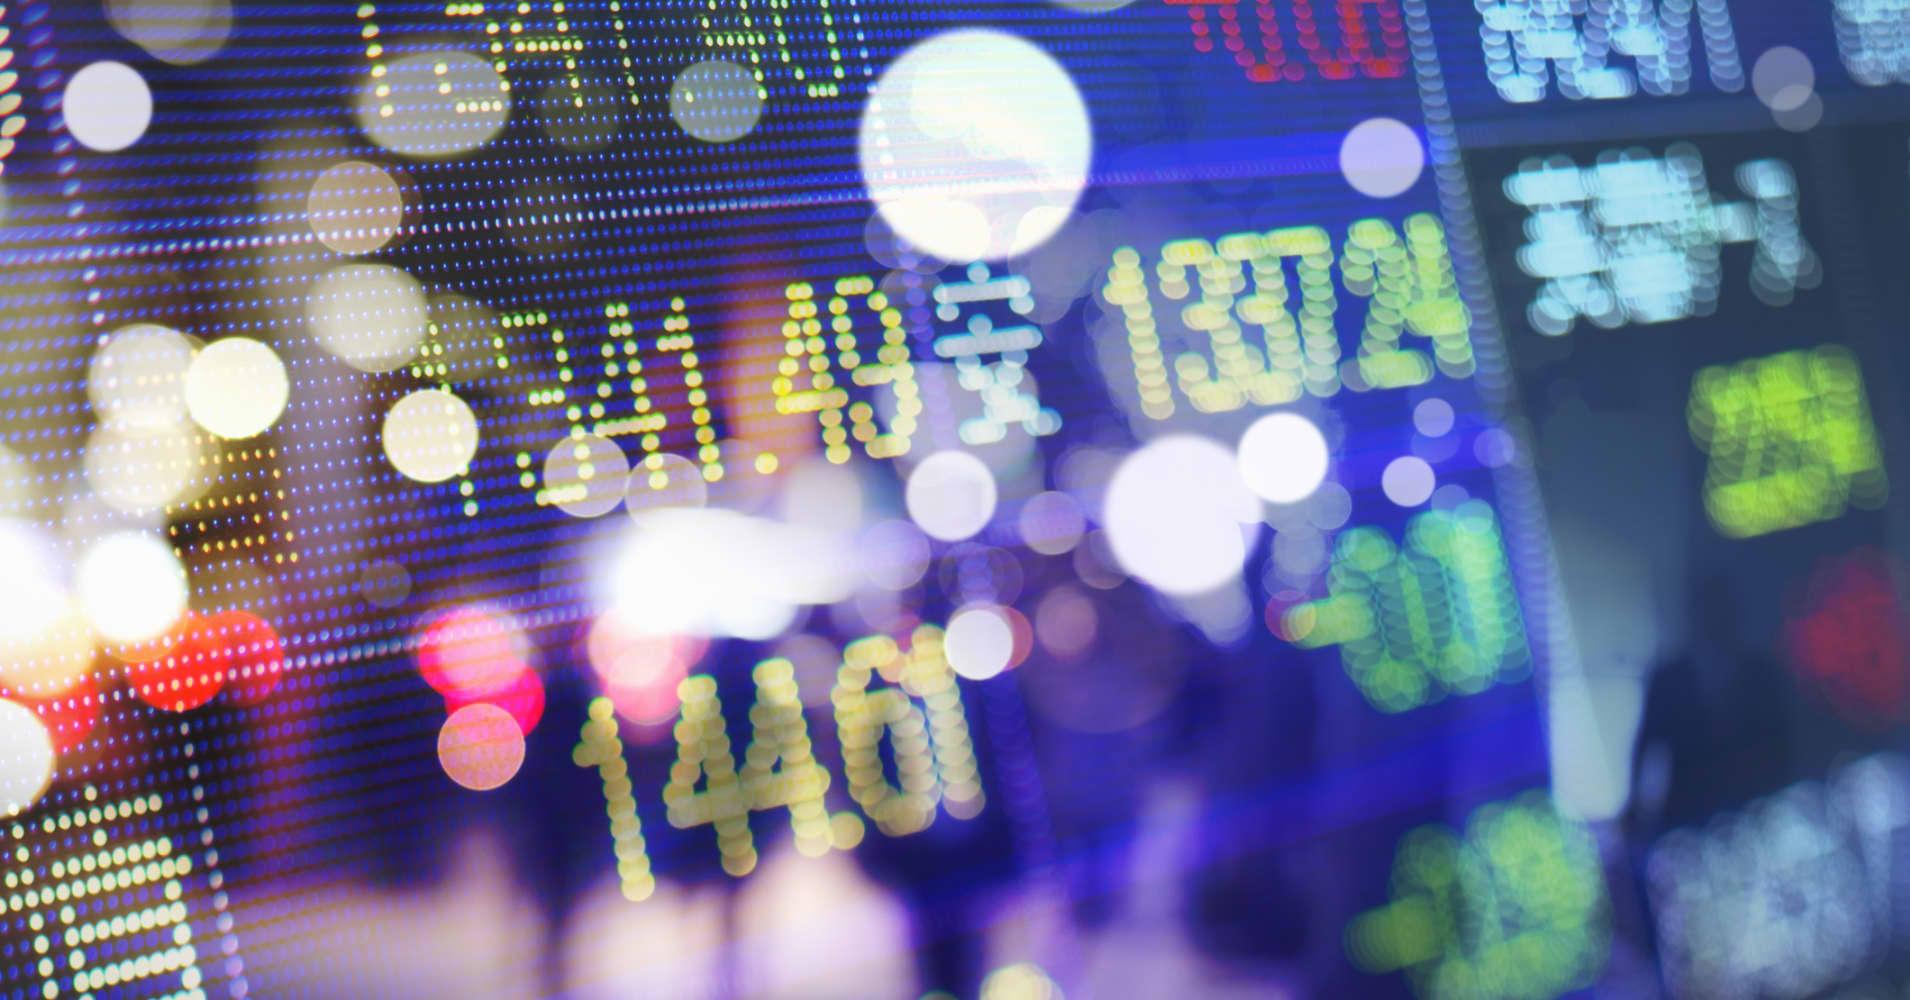 Live blog: Risk sentiment turns sour despite Dow highs, European stocks struggle at open